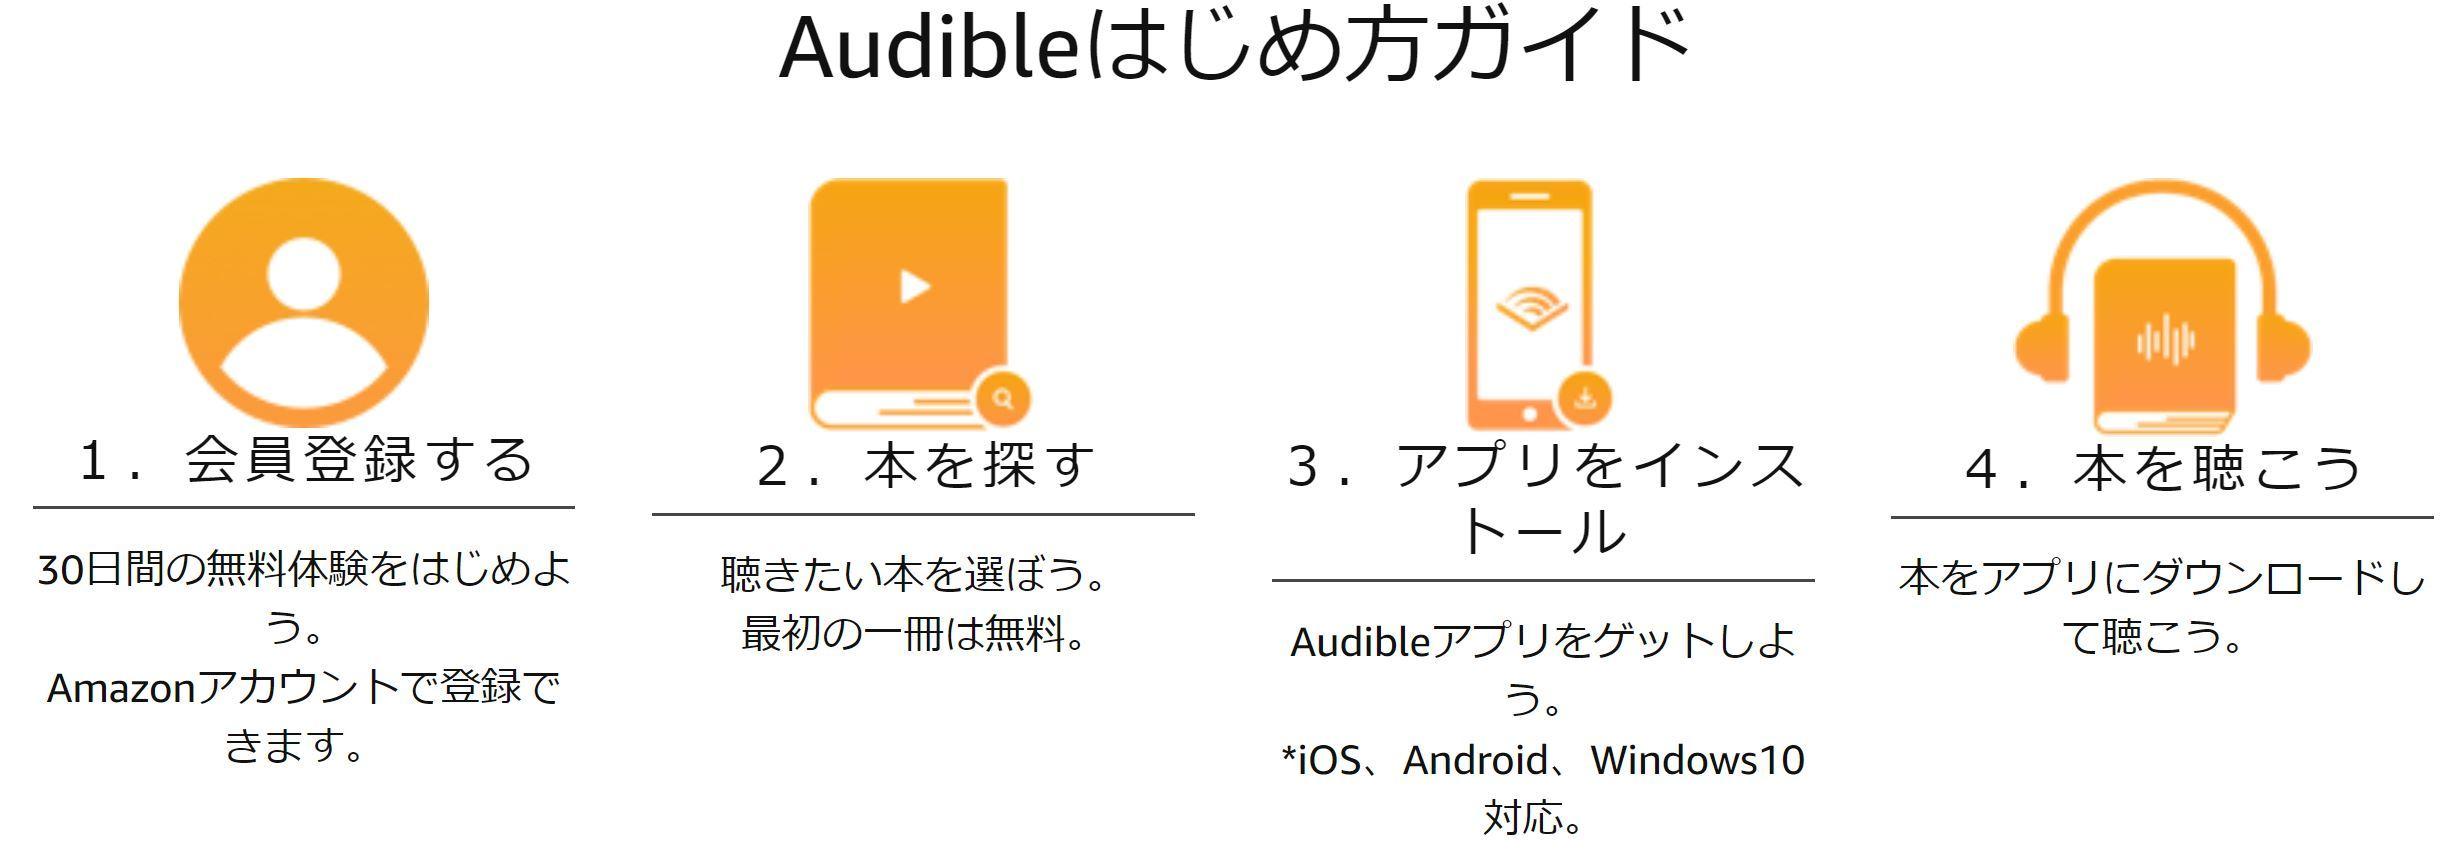 audible2.jpg